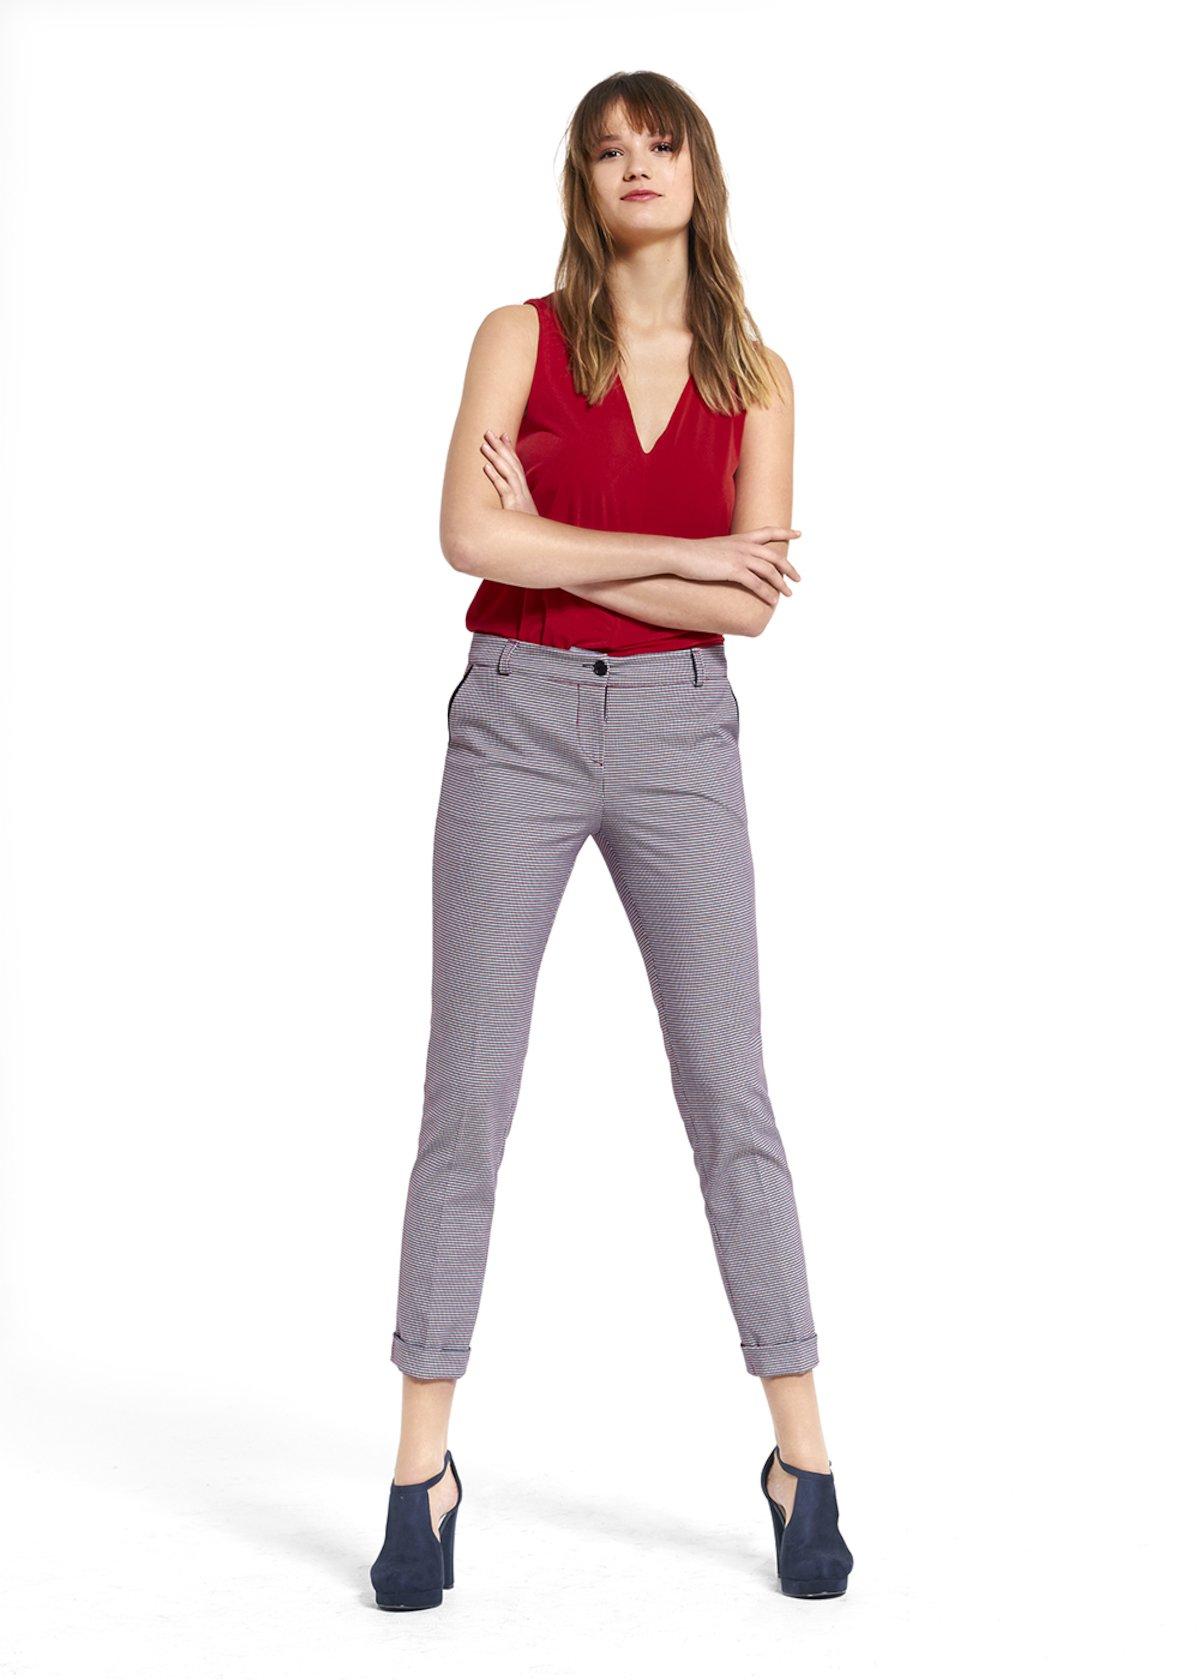 Pantaloni Pilar in tessuto check - Tulipano / Blue Fantasia - Donna - Immagine categoria